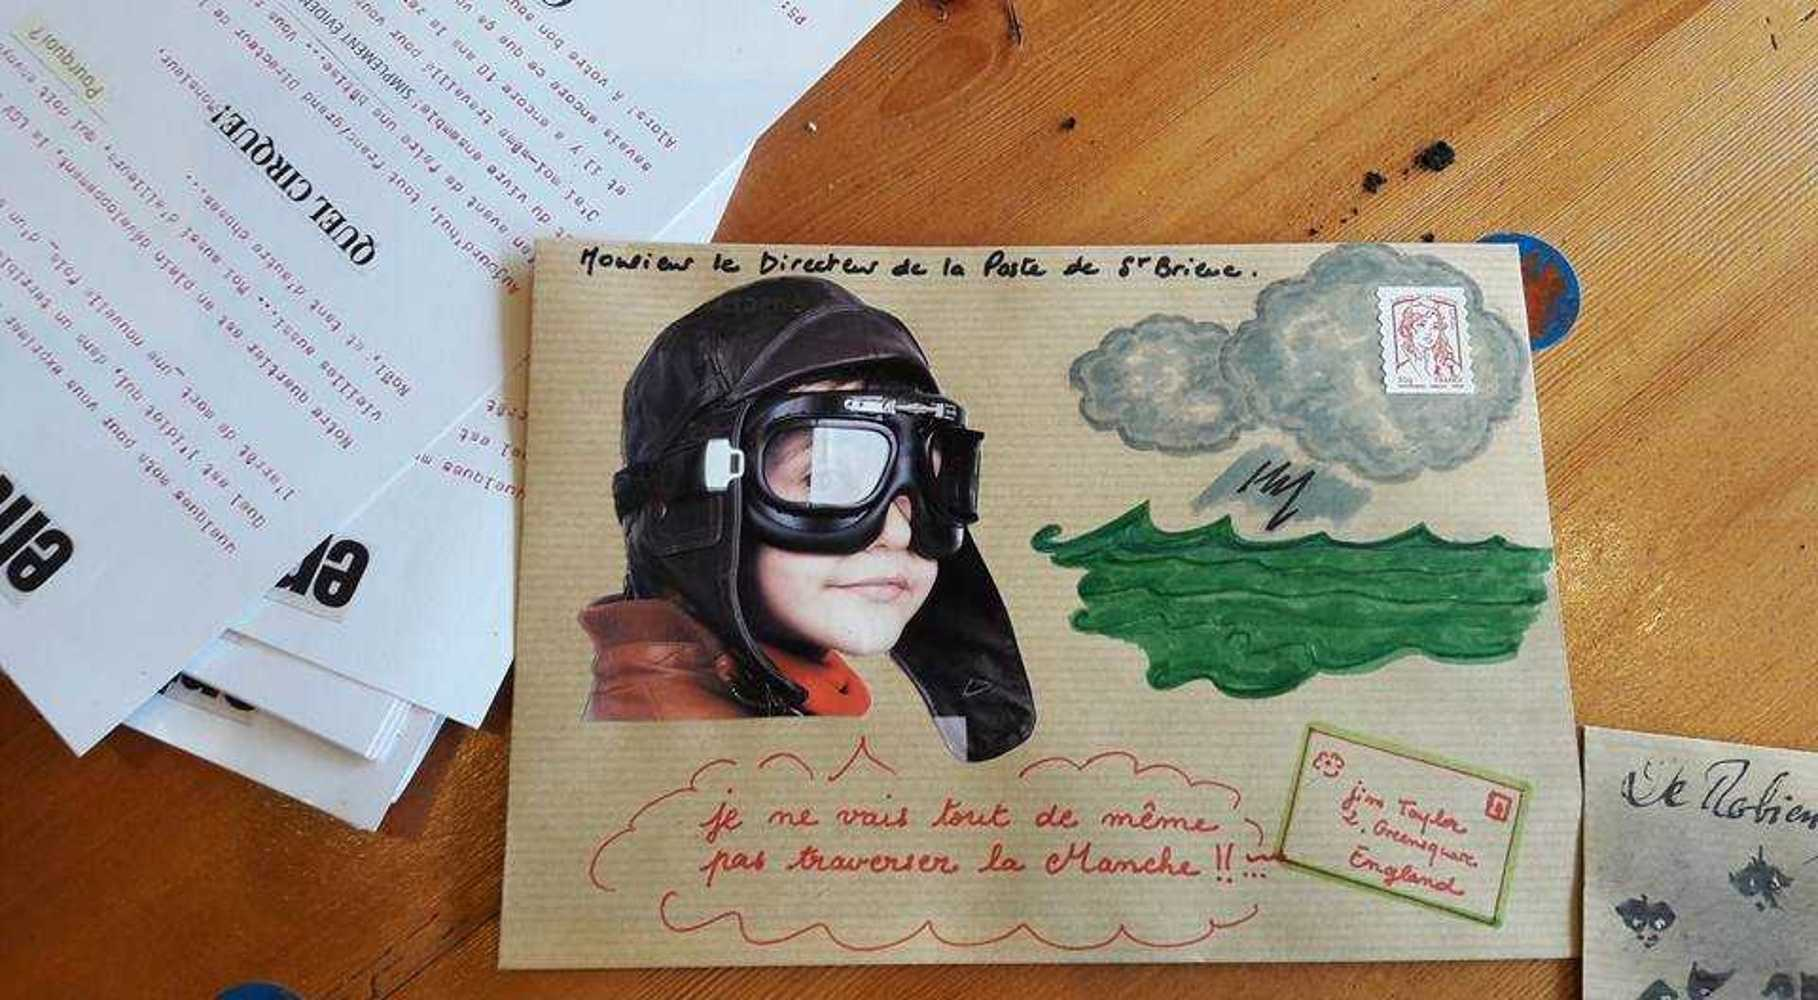 L''art postal pour défendre la poste 276550522121684857849620772846568314396830n